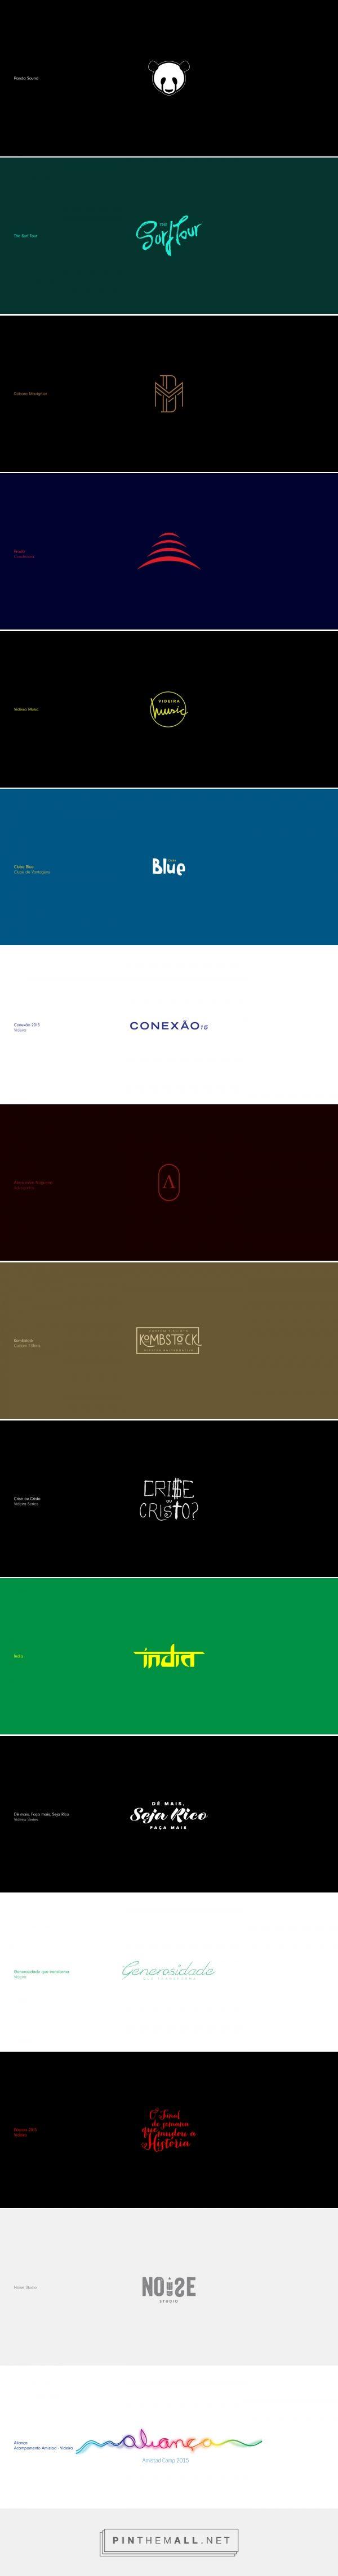 Logofolio 2015 on Behance - created via https://pinthemall.net  #panda #surf #tour #songriter #singer #dm #monogram #animal #illustration #up #red #construction #enginner #music #videira #blue #clubeblue  #conexao #conection #law #lawyer #tshirt #kombstock #crise #christ #india #noise #studio #logofolio #graphicdesign #branding #brand #logo2015 #logos #oficiallogo #levileal #designer #tipograph